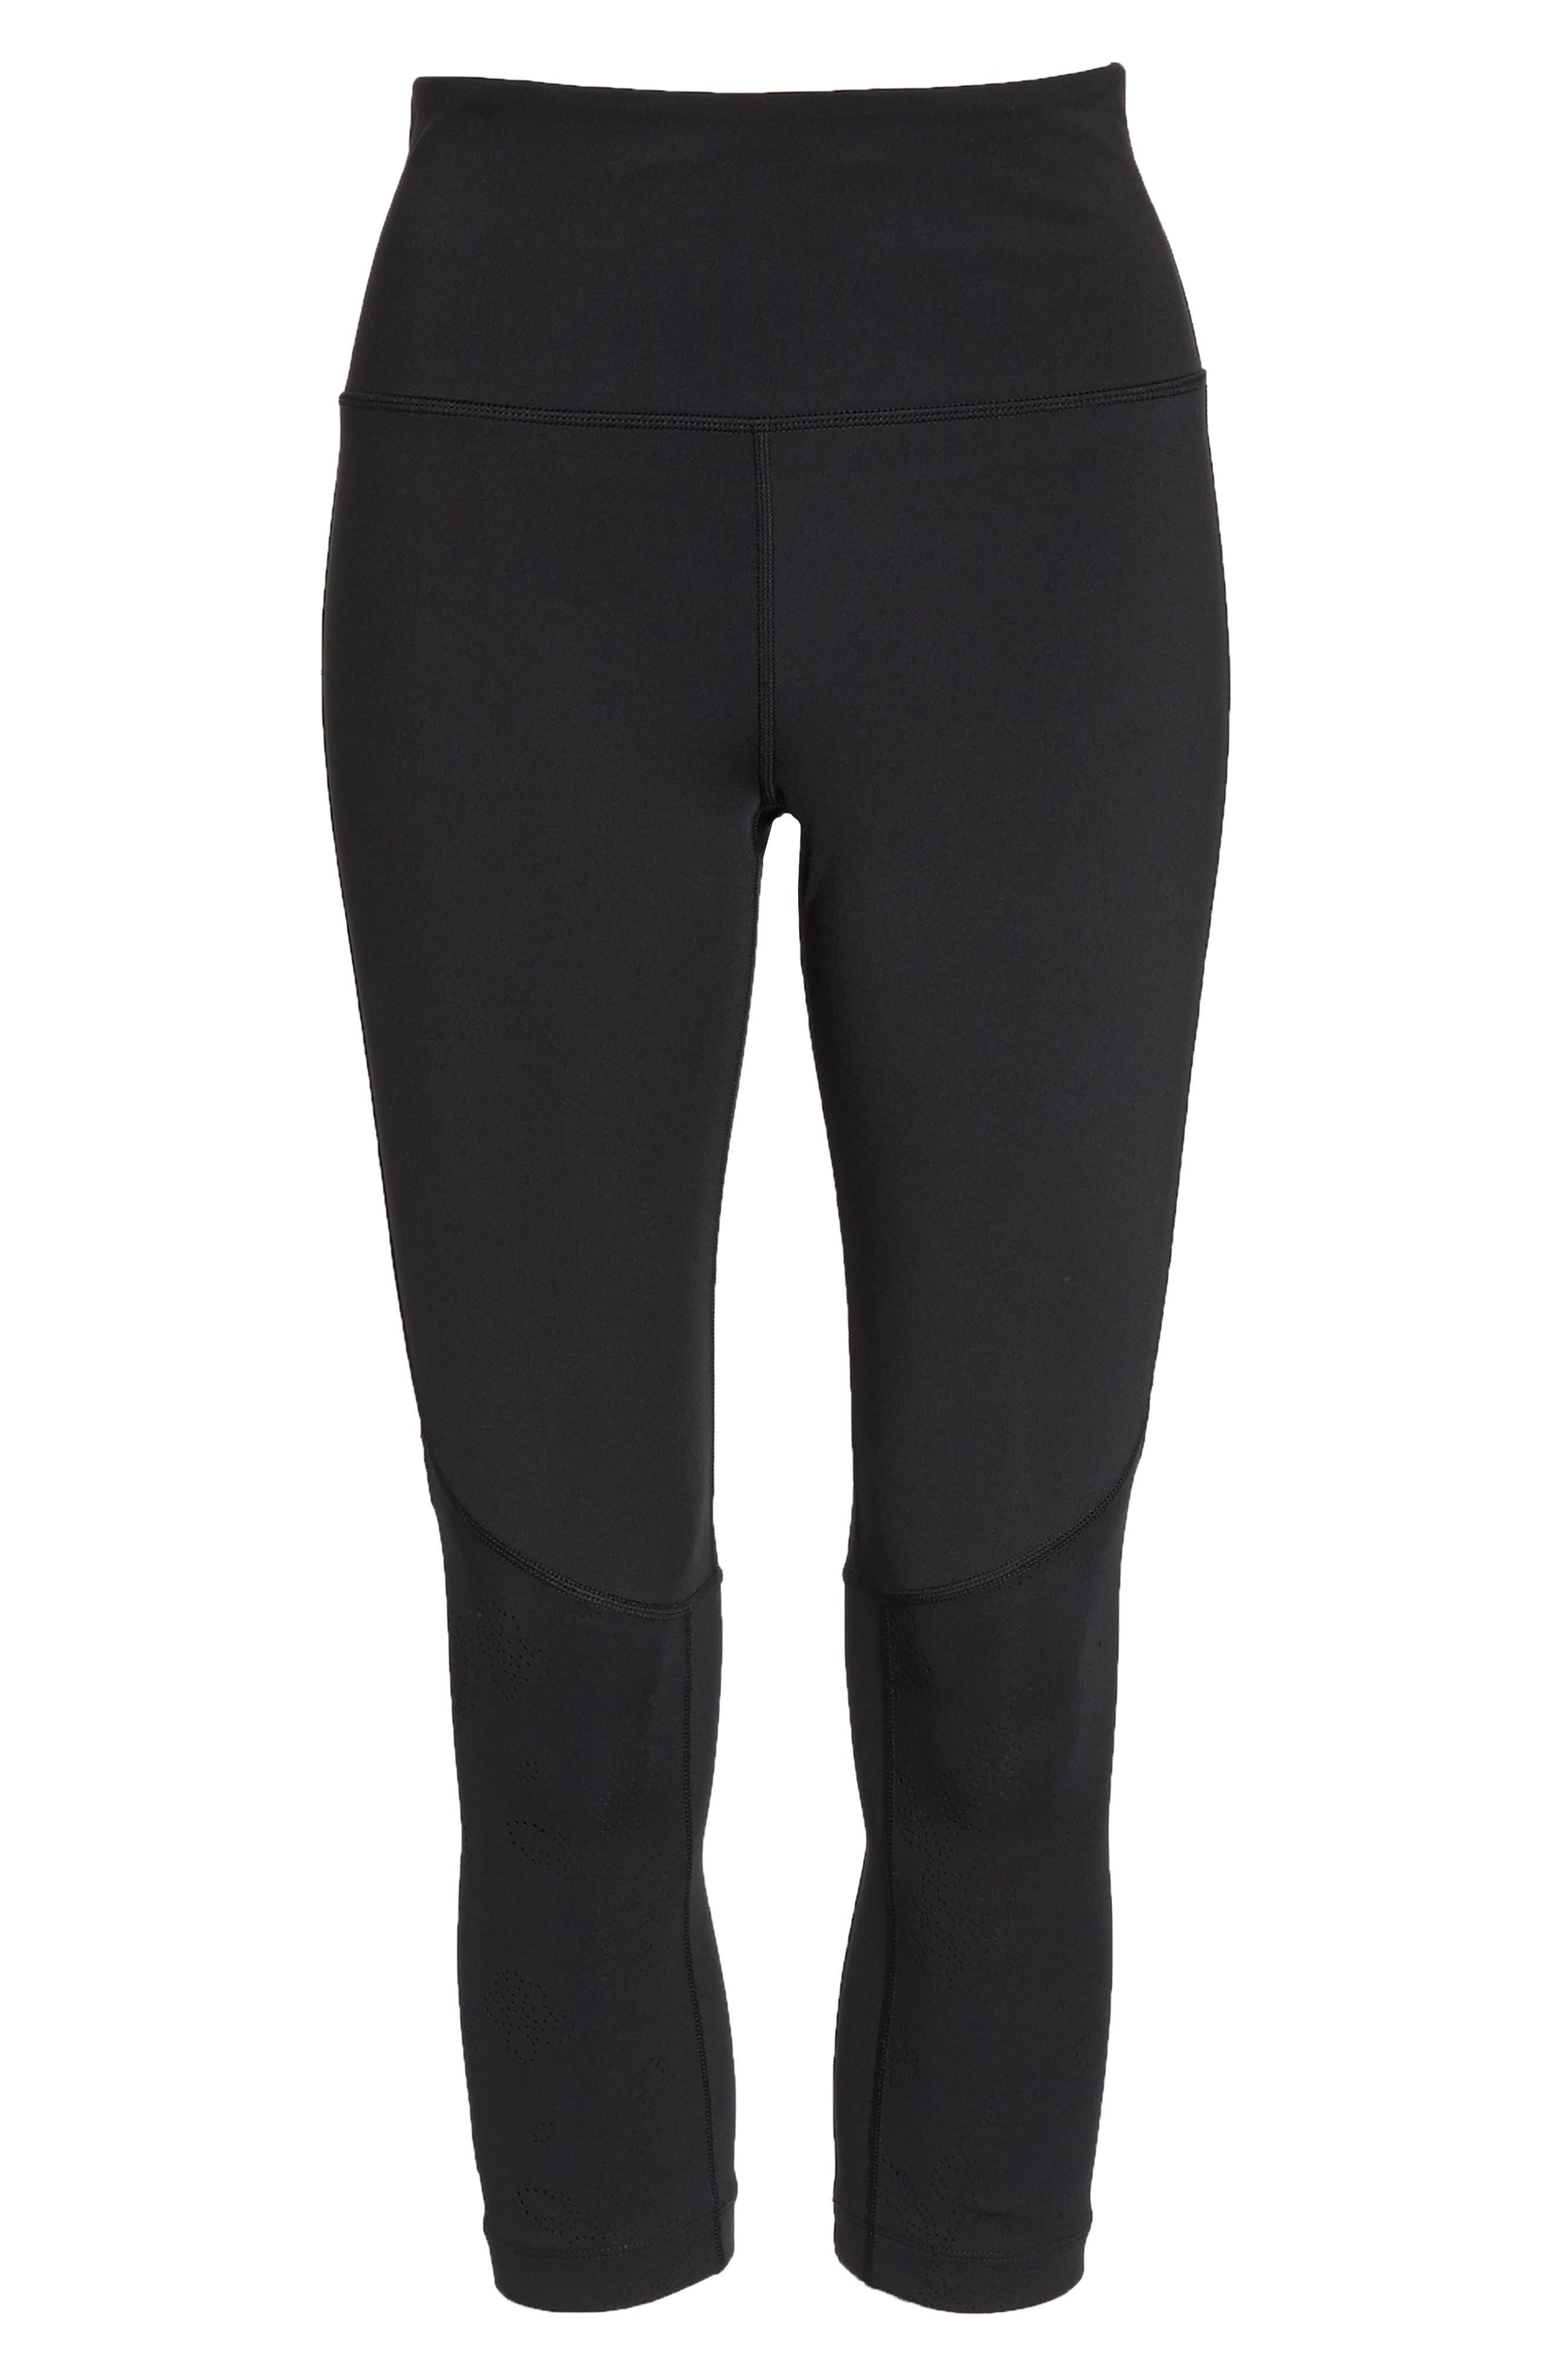 floral laser cut leggings,                             Alternate thumbnail 6, color,                             Black